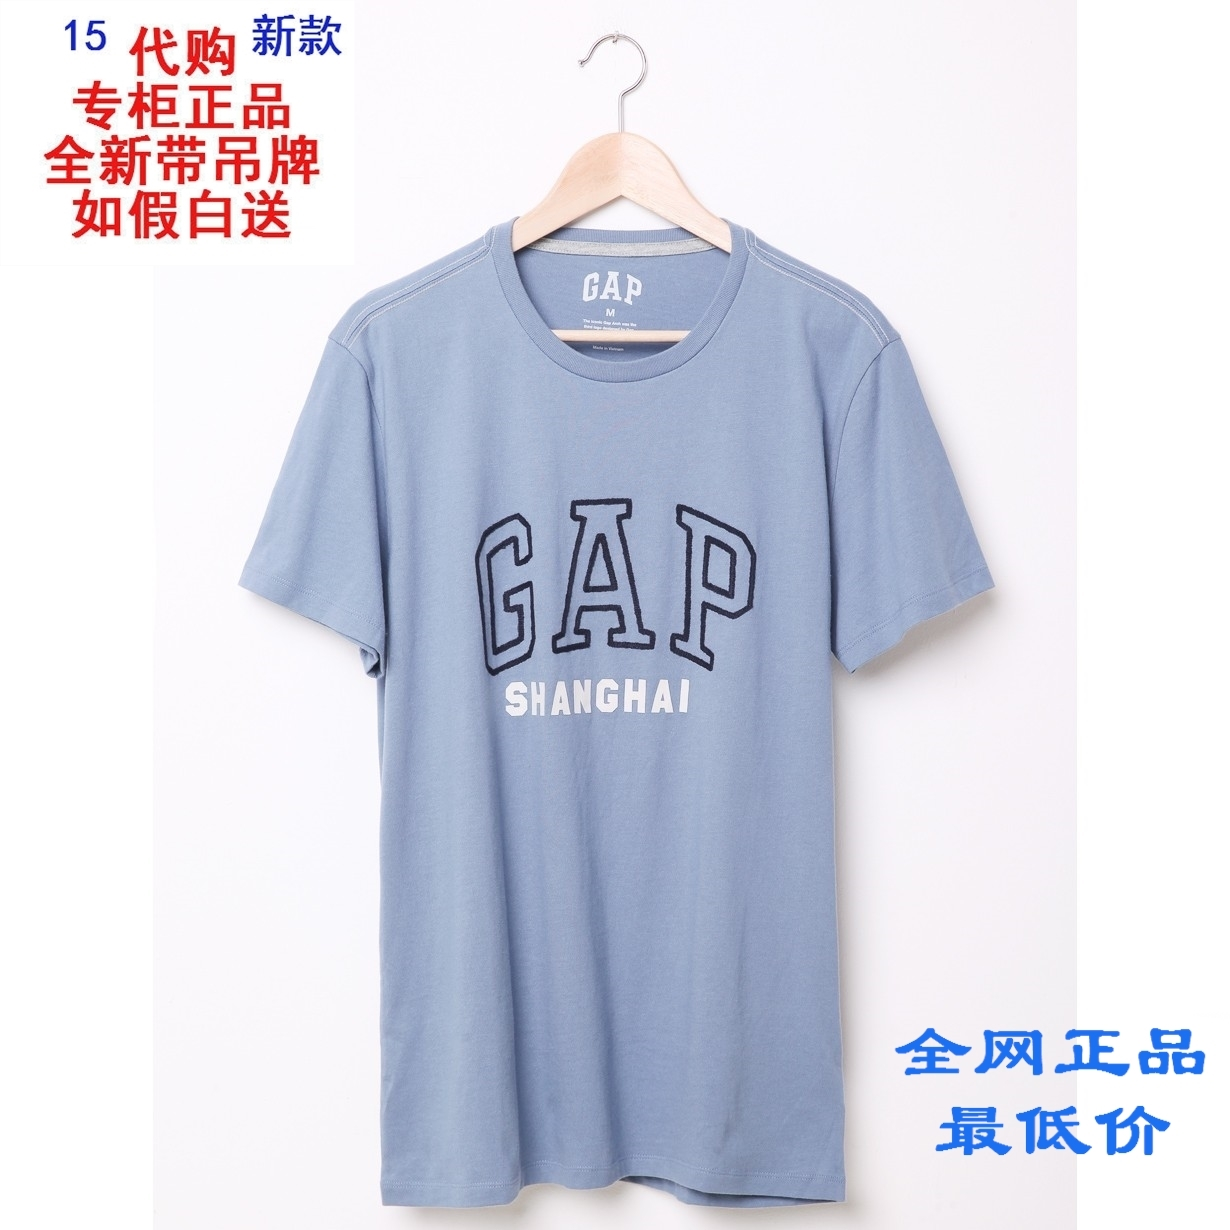 Футболка мужская GAP 000415934 415934 рубашка мужская gap 142643 349